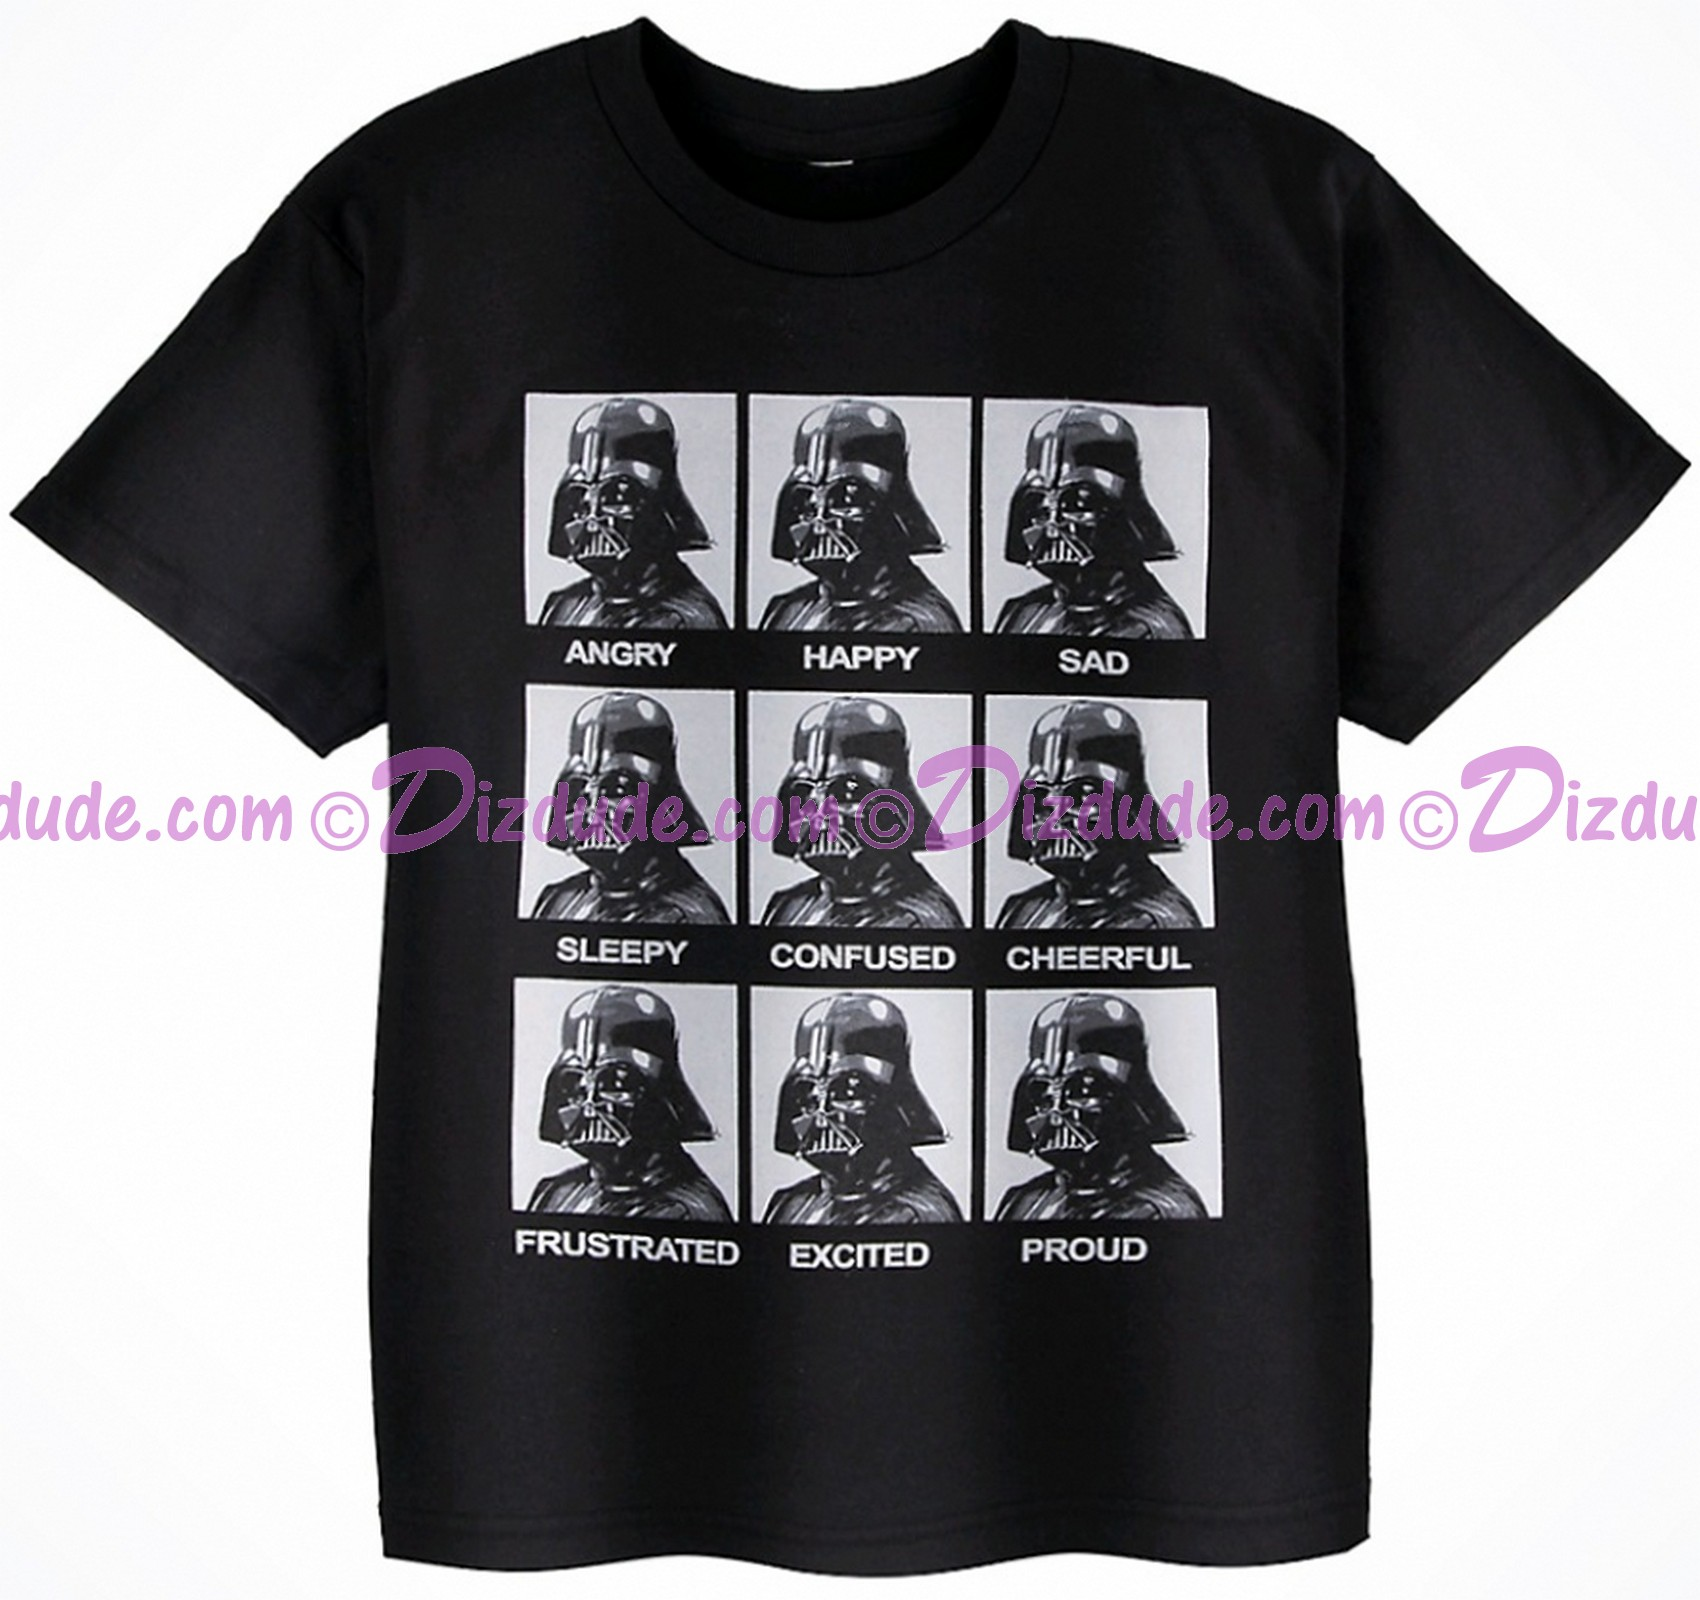 Vintage Star Wars Darth Vader Emotions Youth T-Shirt (Tshirt, T shirt or Tee) © Dizdude.com